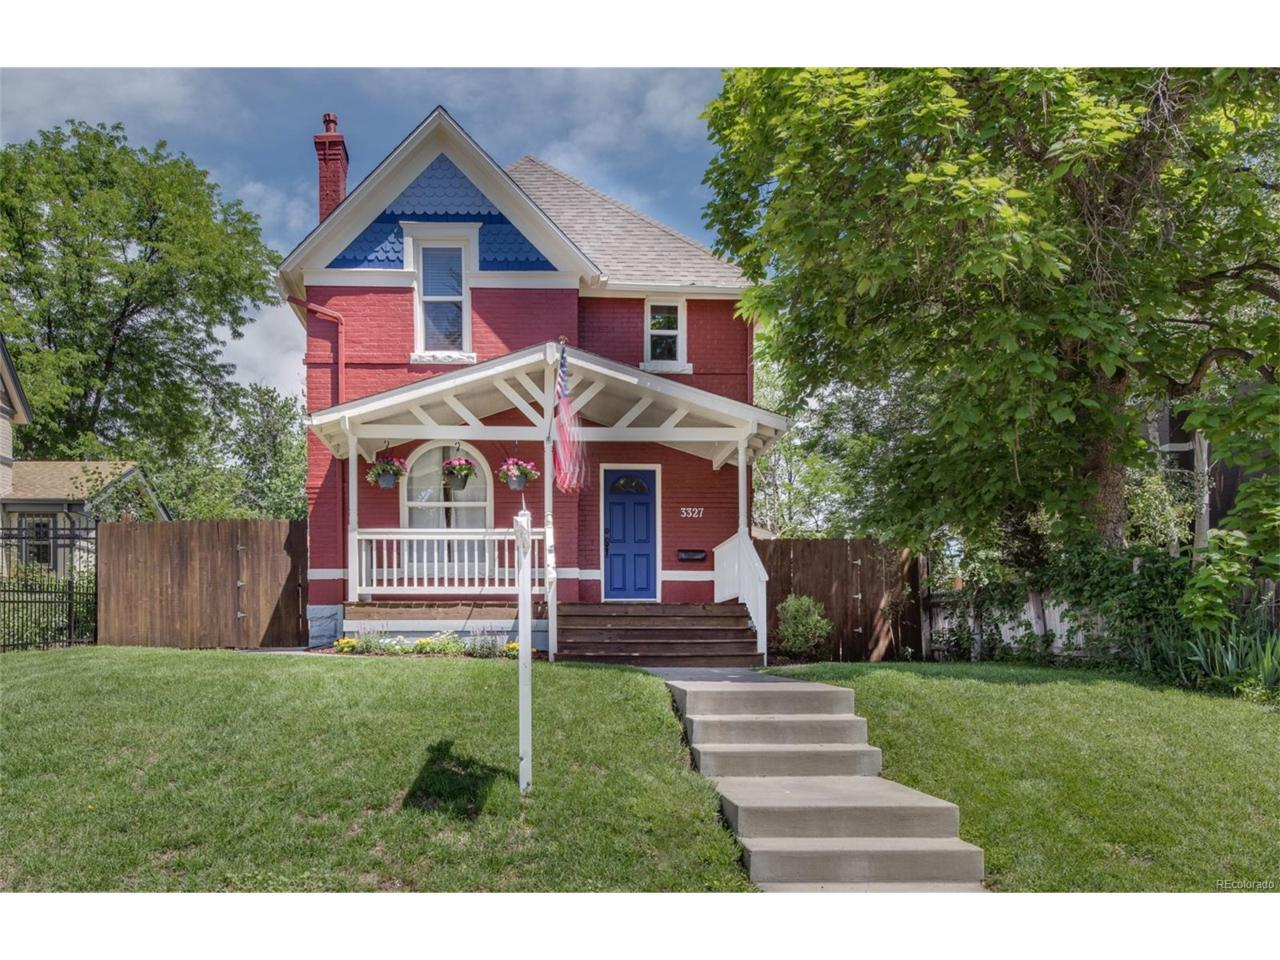 3327 W 29th Avenue, Denver, CO 80211 (MLS #6571631) :: 8z Real Estate